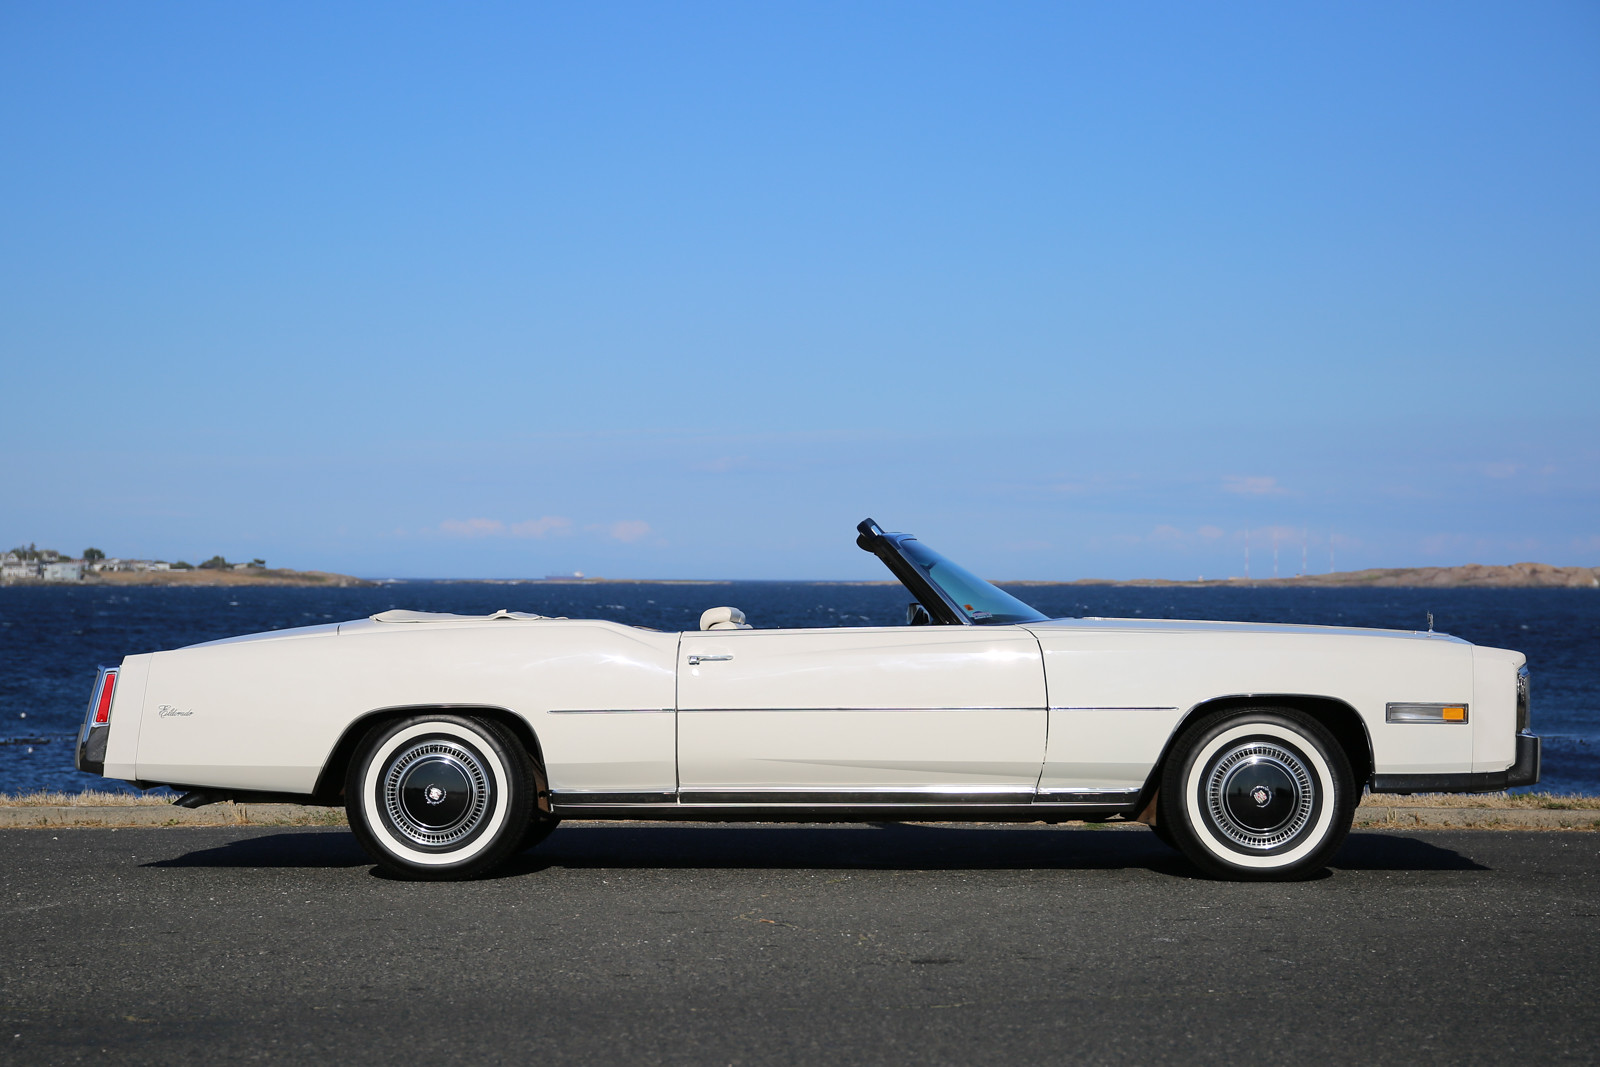 1976 Cadillac Fleetwood Eldorado Convertible Silver